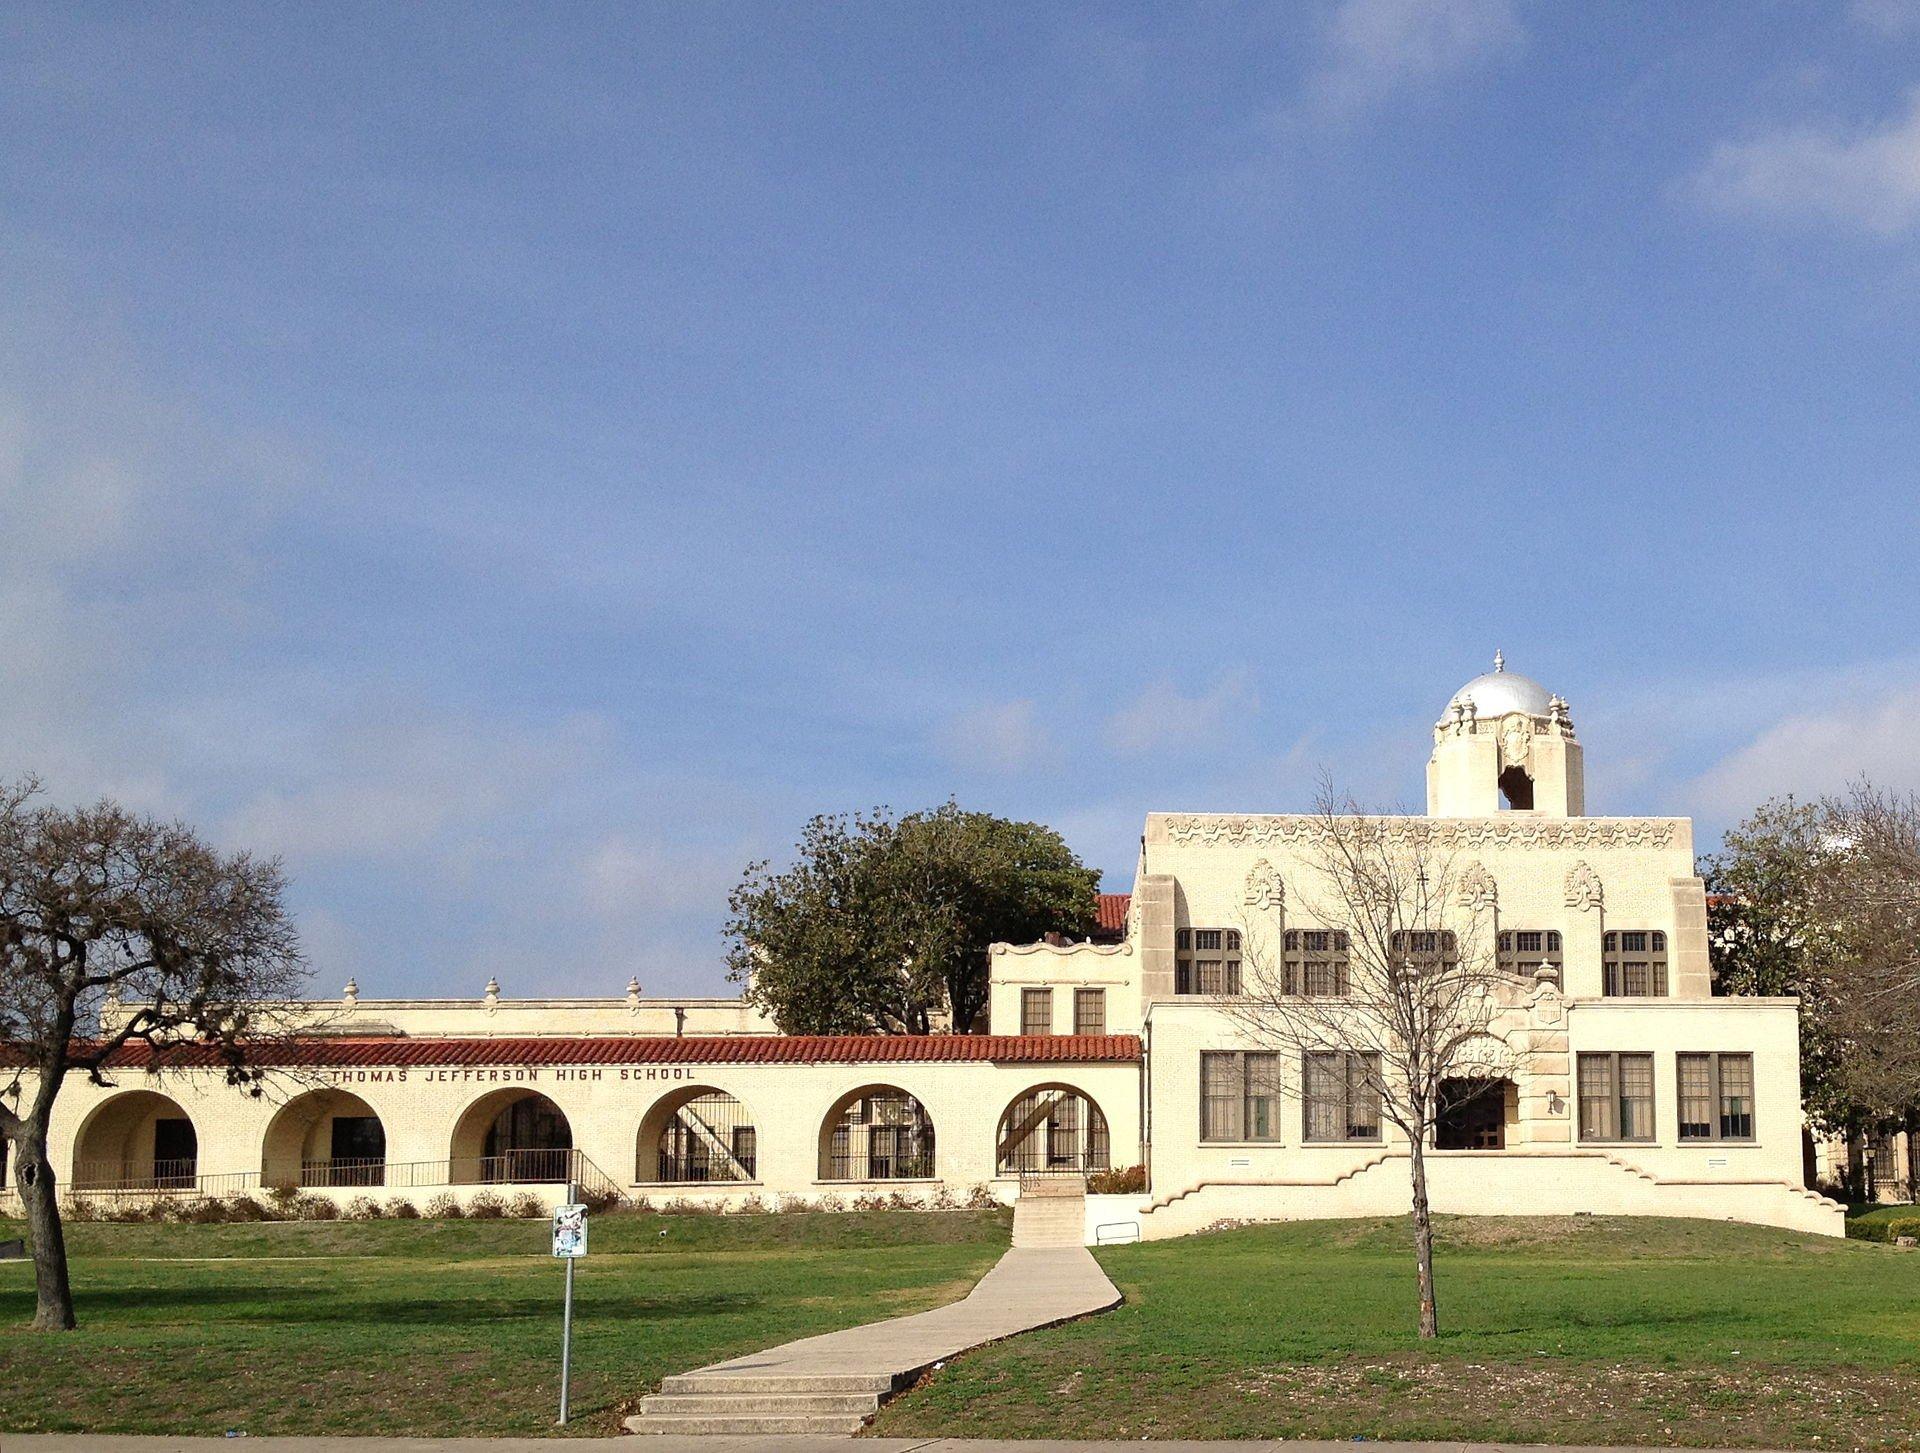 Thomas Jefferson High School in San Antonio, Texas